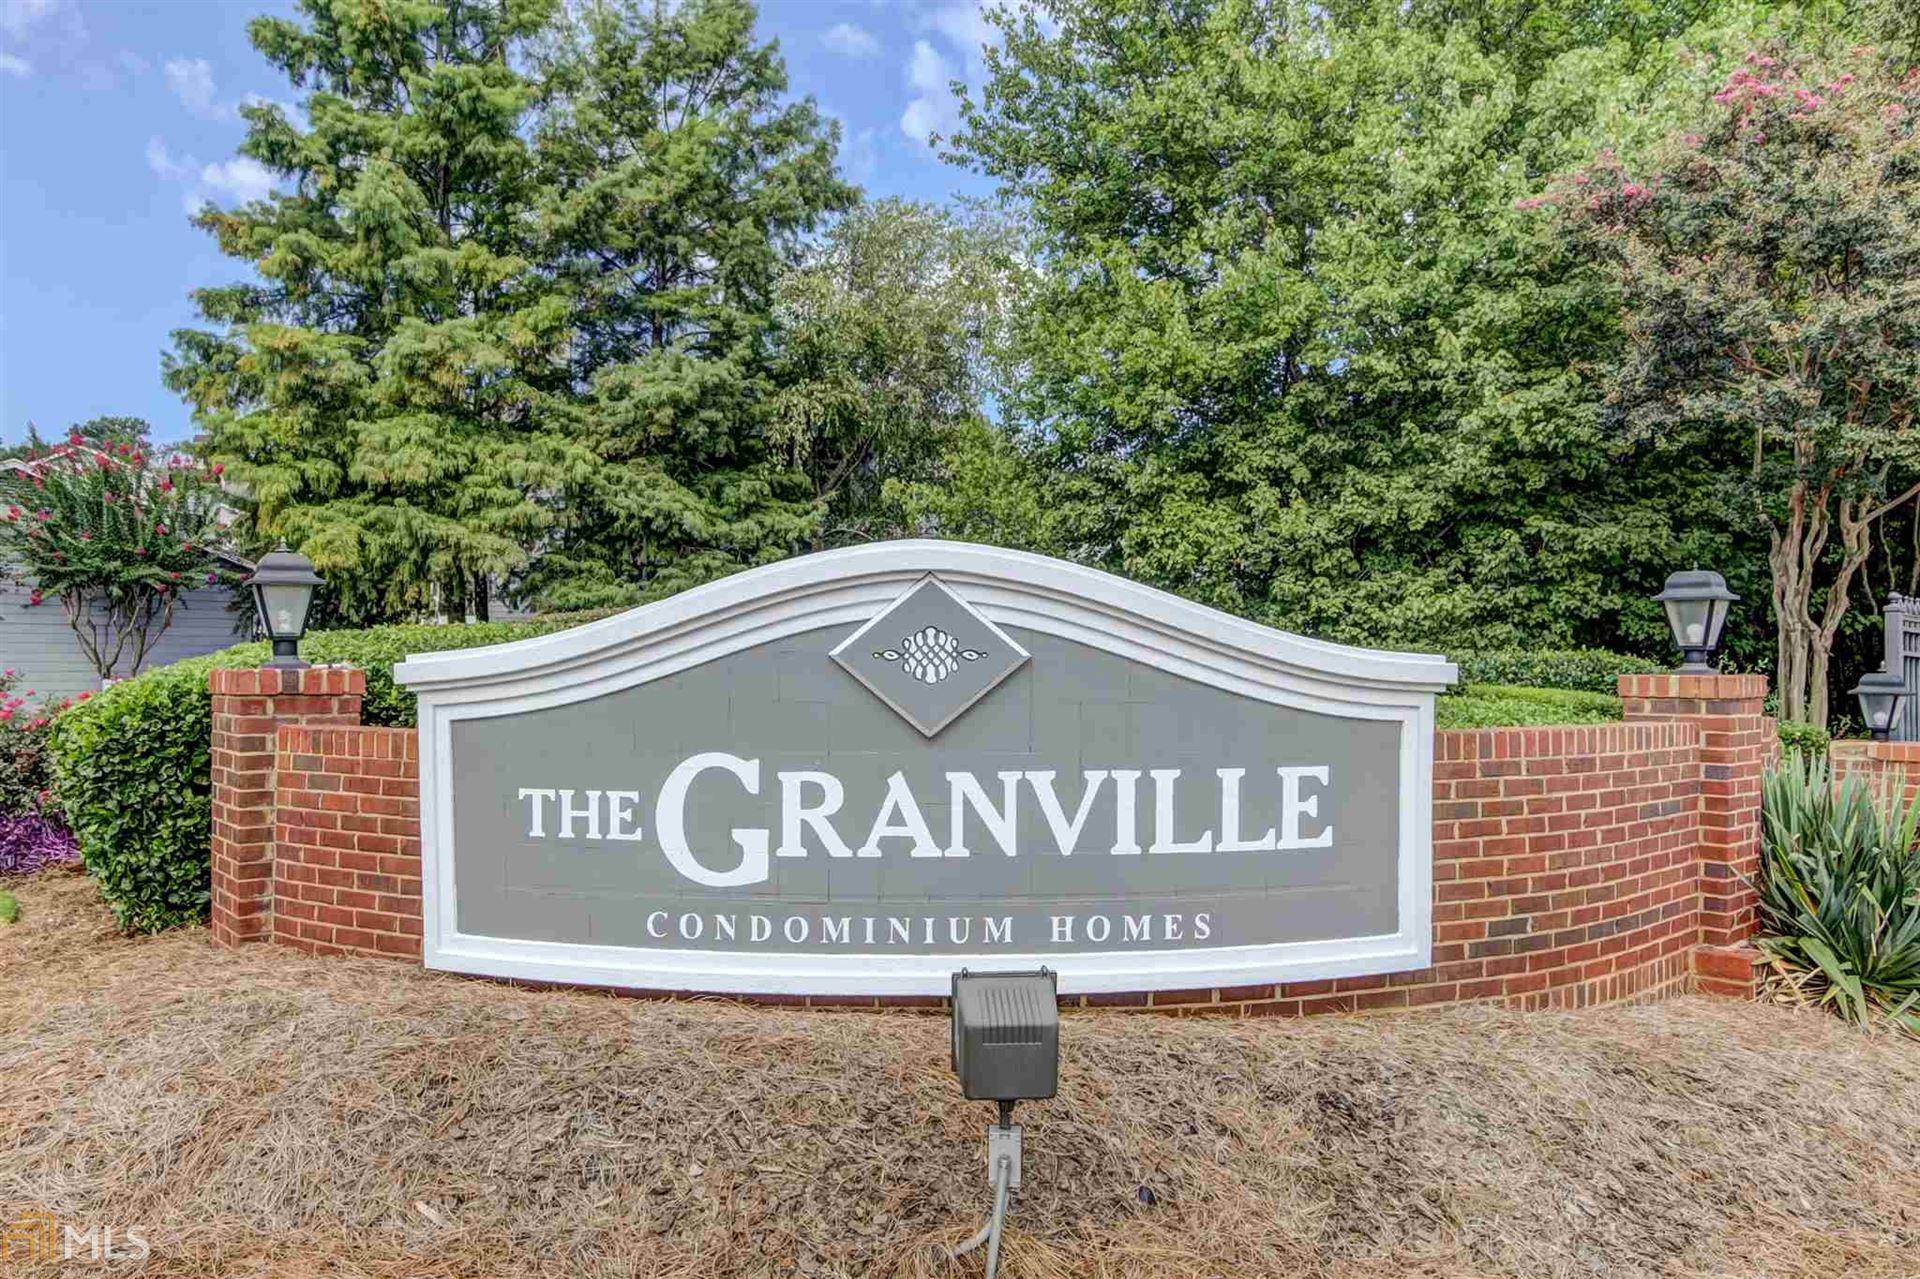 642 Granville Ct, Sandy Springs, GA 30328 - #: 8806695